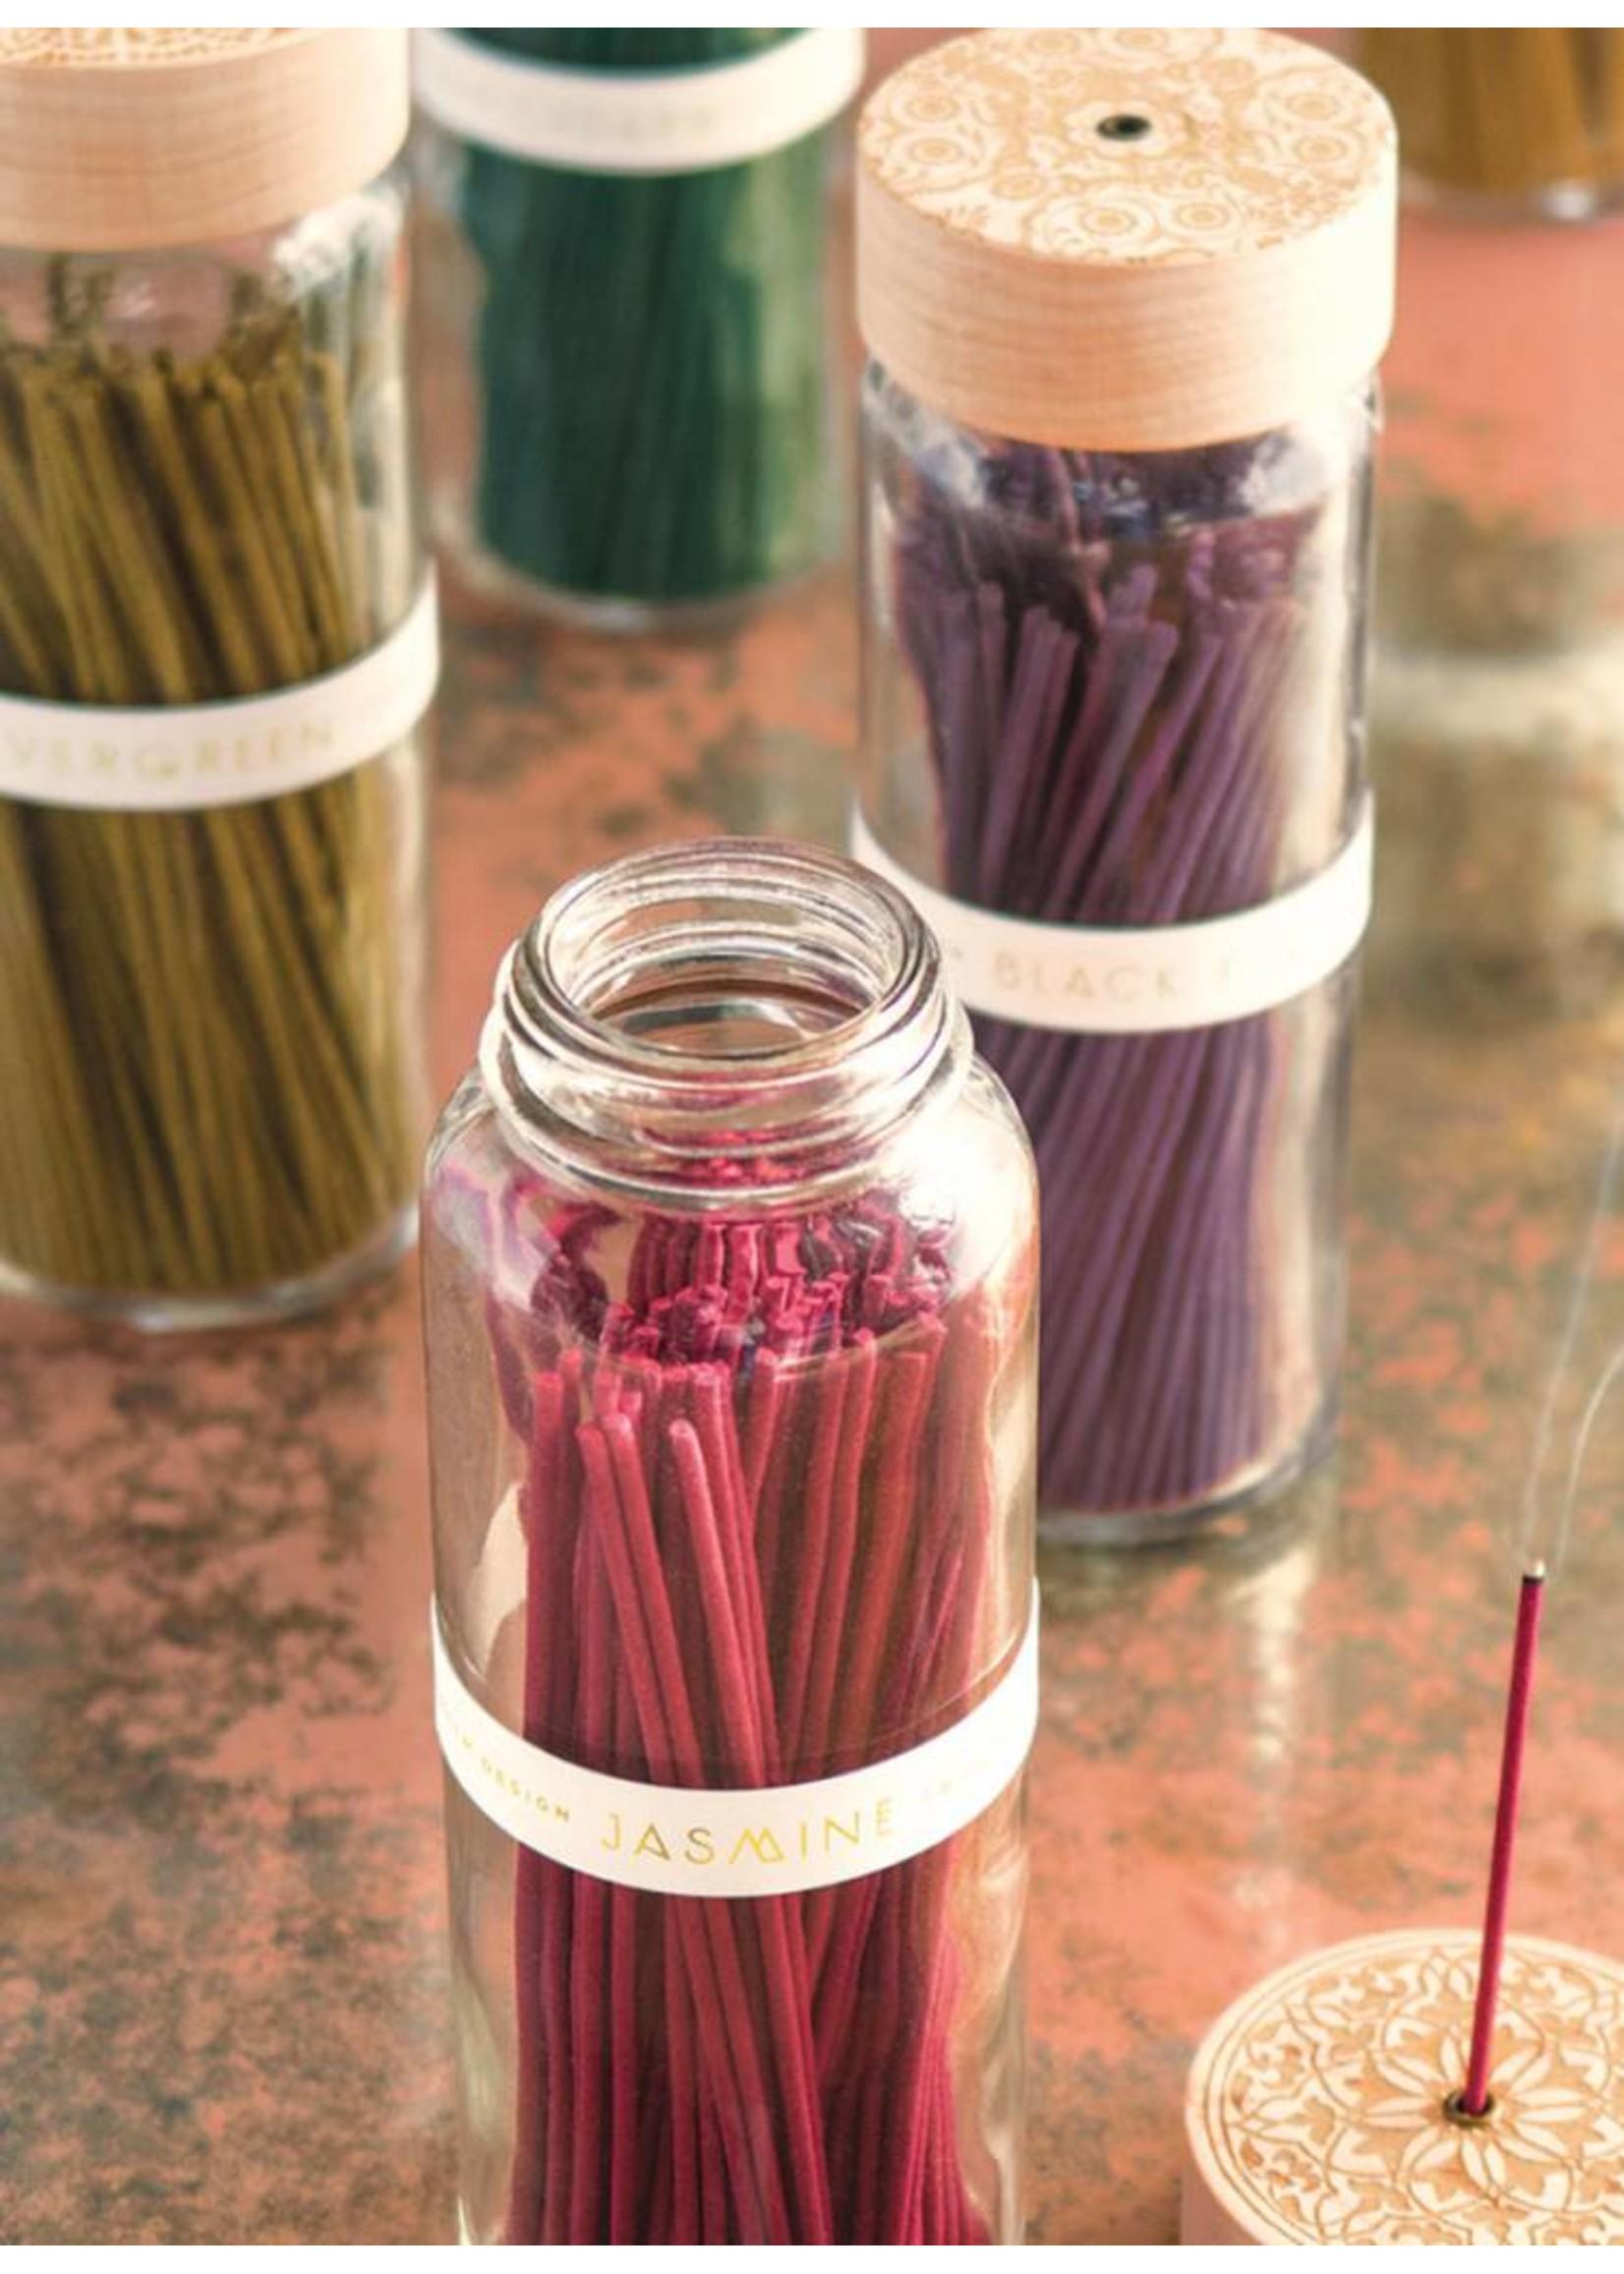 Seem Satori Incense